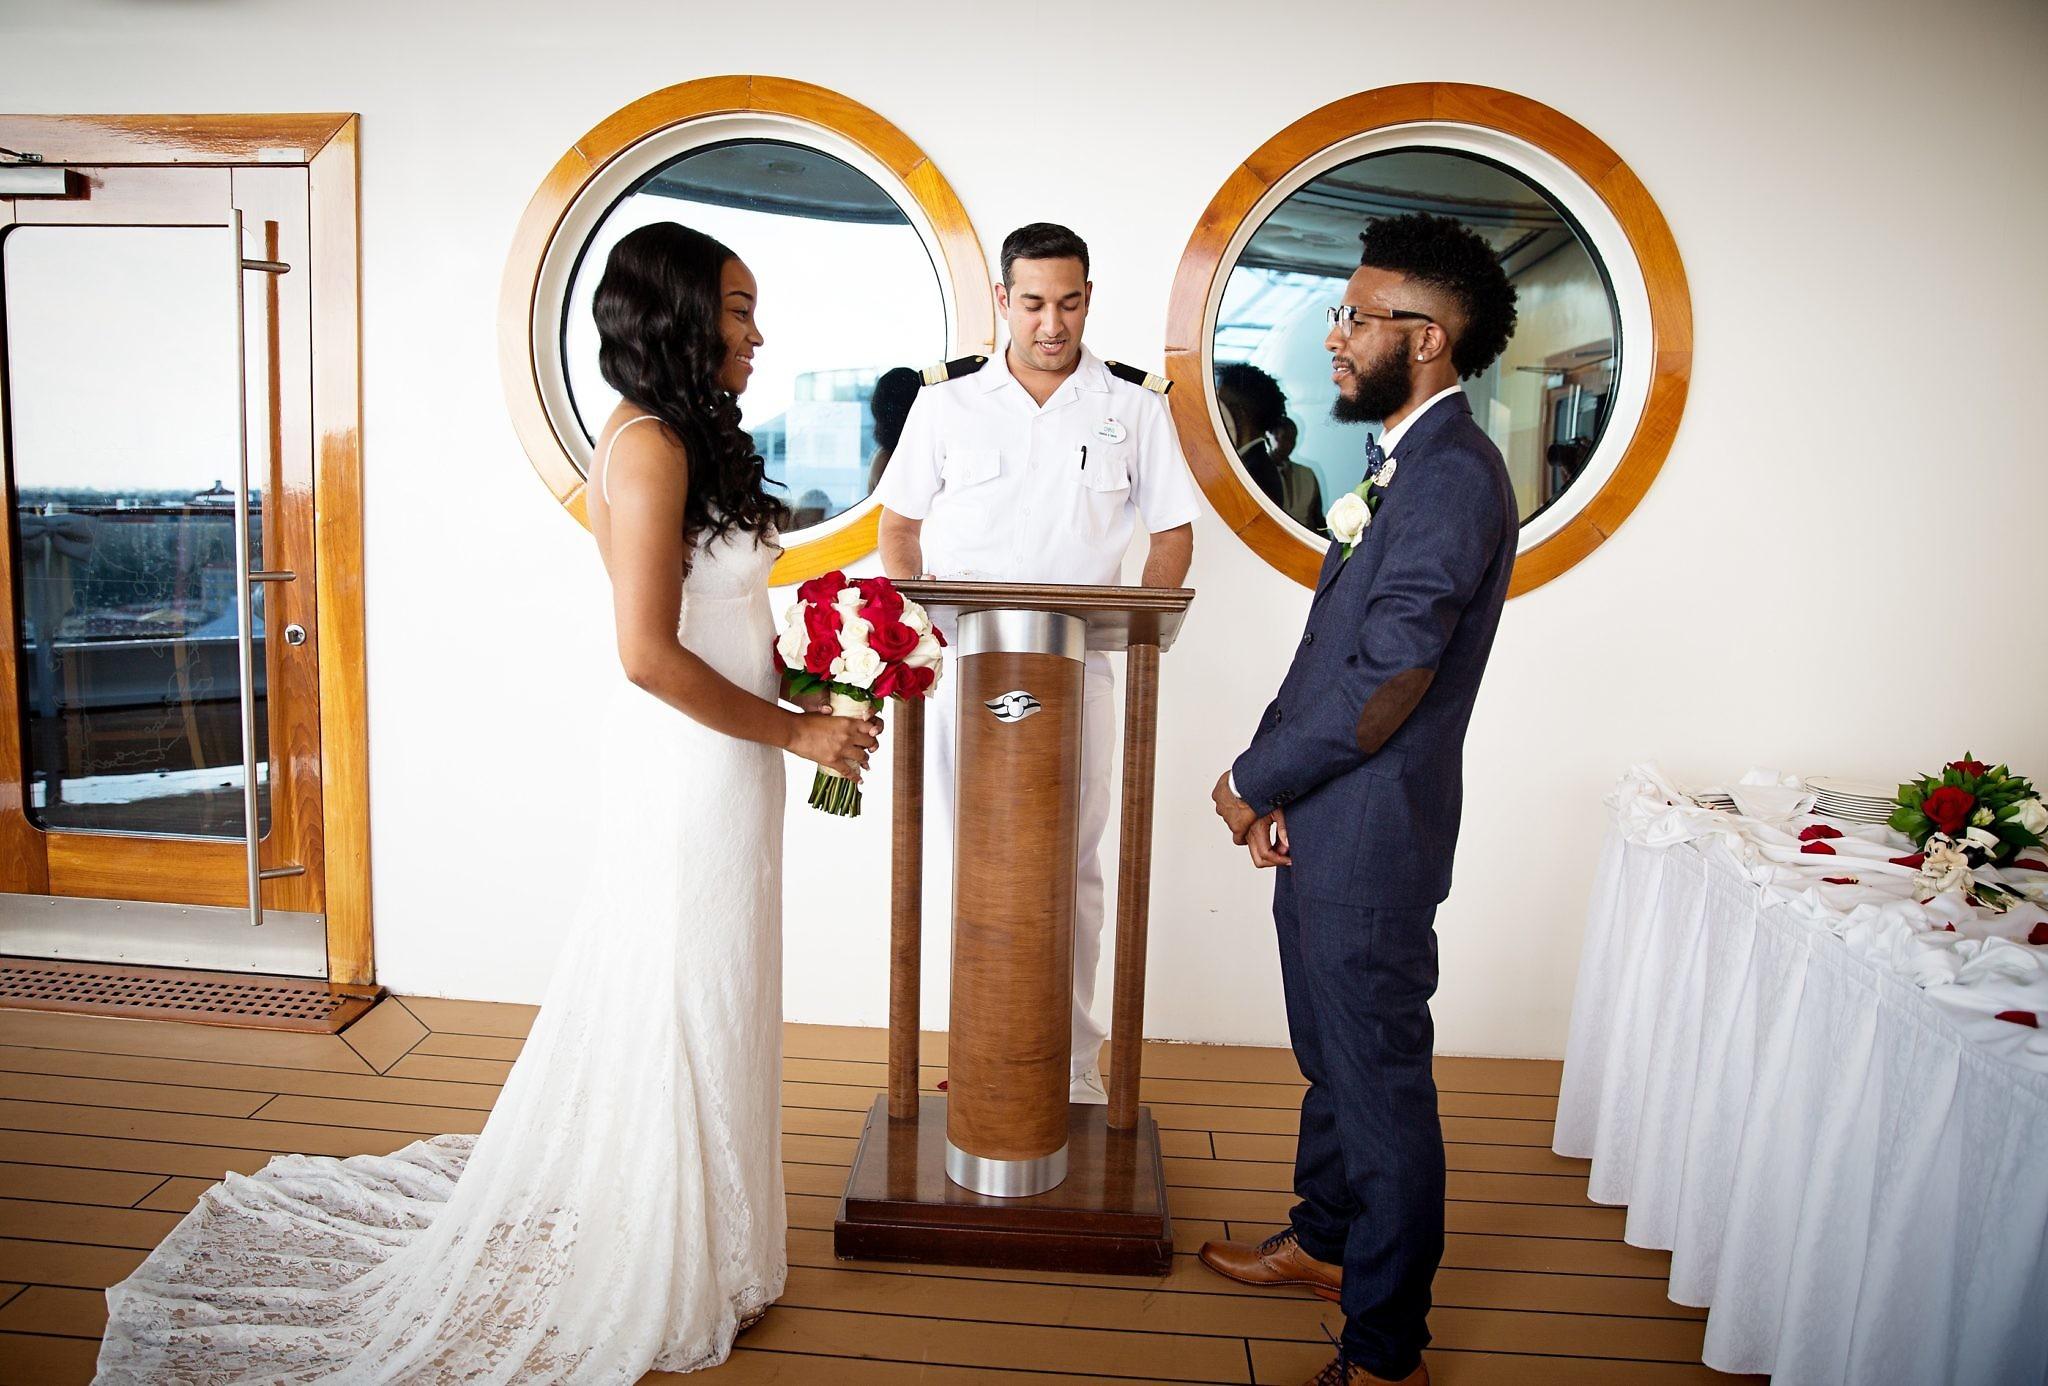 Disney Cruise Wedding.Alia Deangelo S Fairytale Disney Dream Cruise Wedding